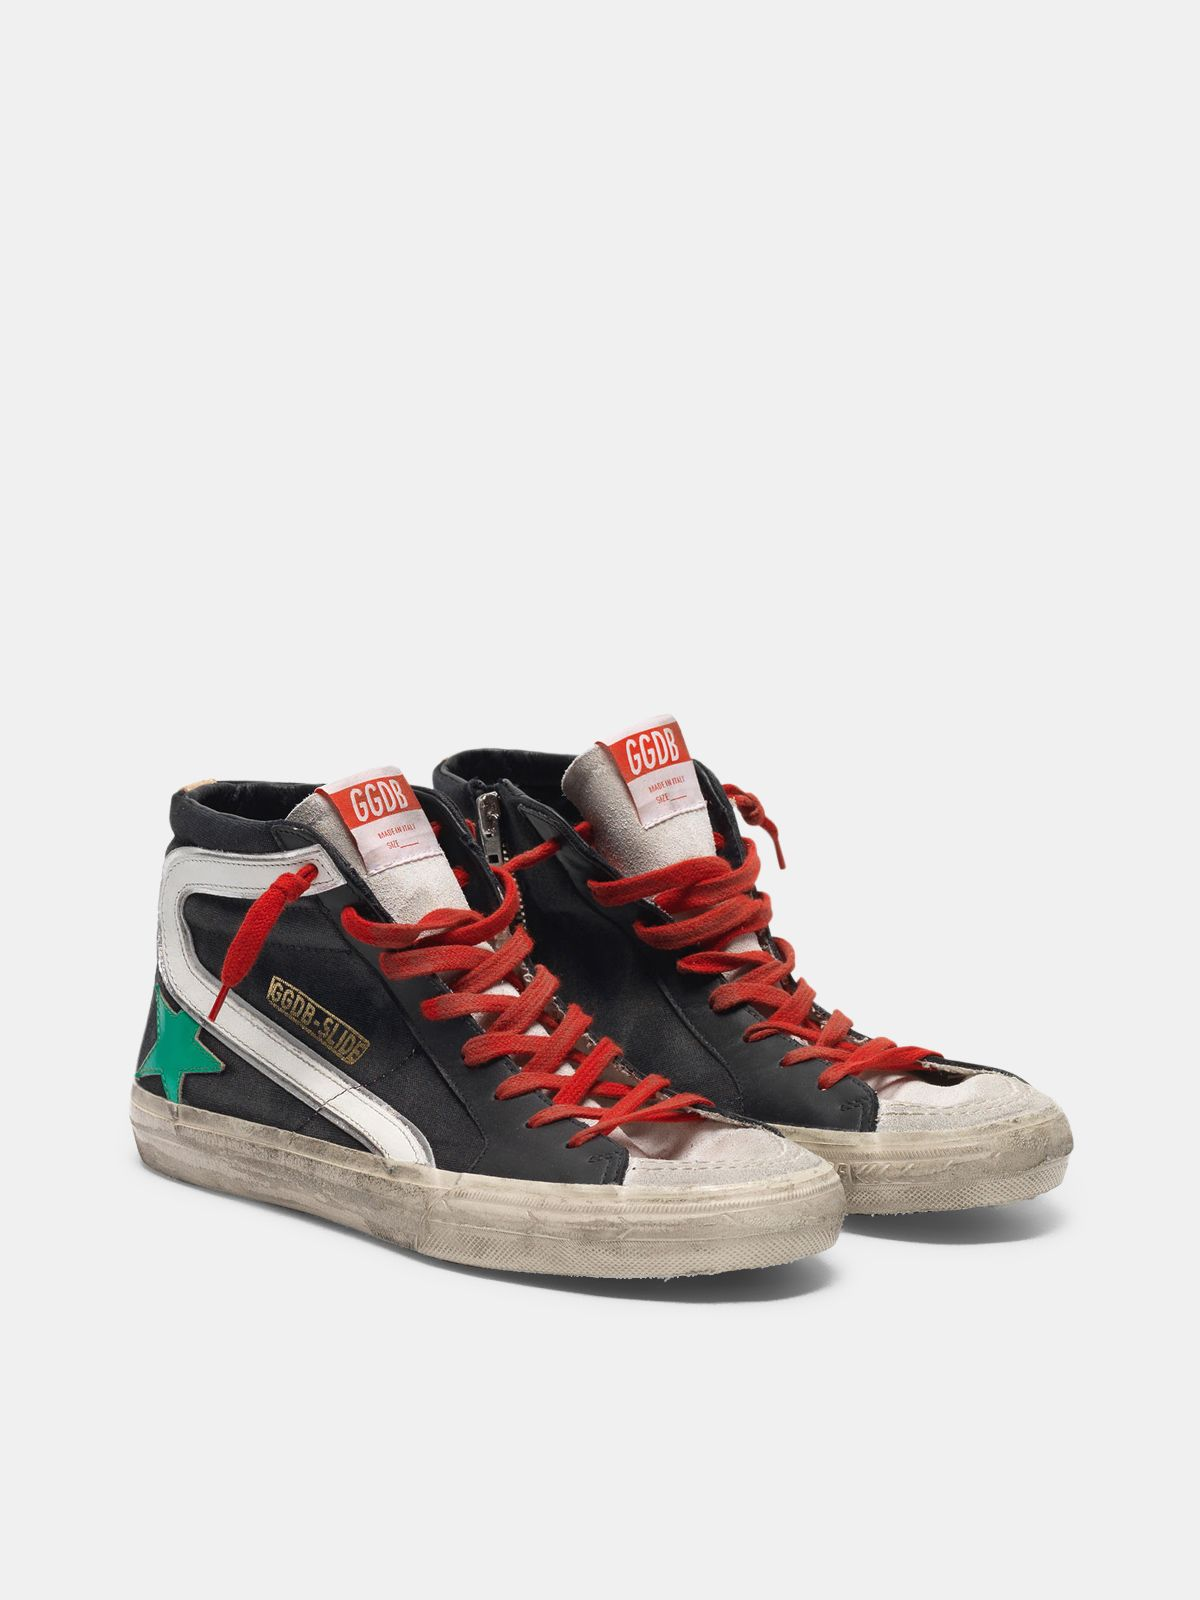 Golden Goose - Sneakers Slide nere in tela con stella verde metallizzata in